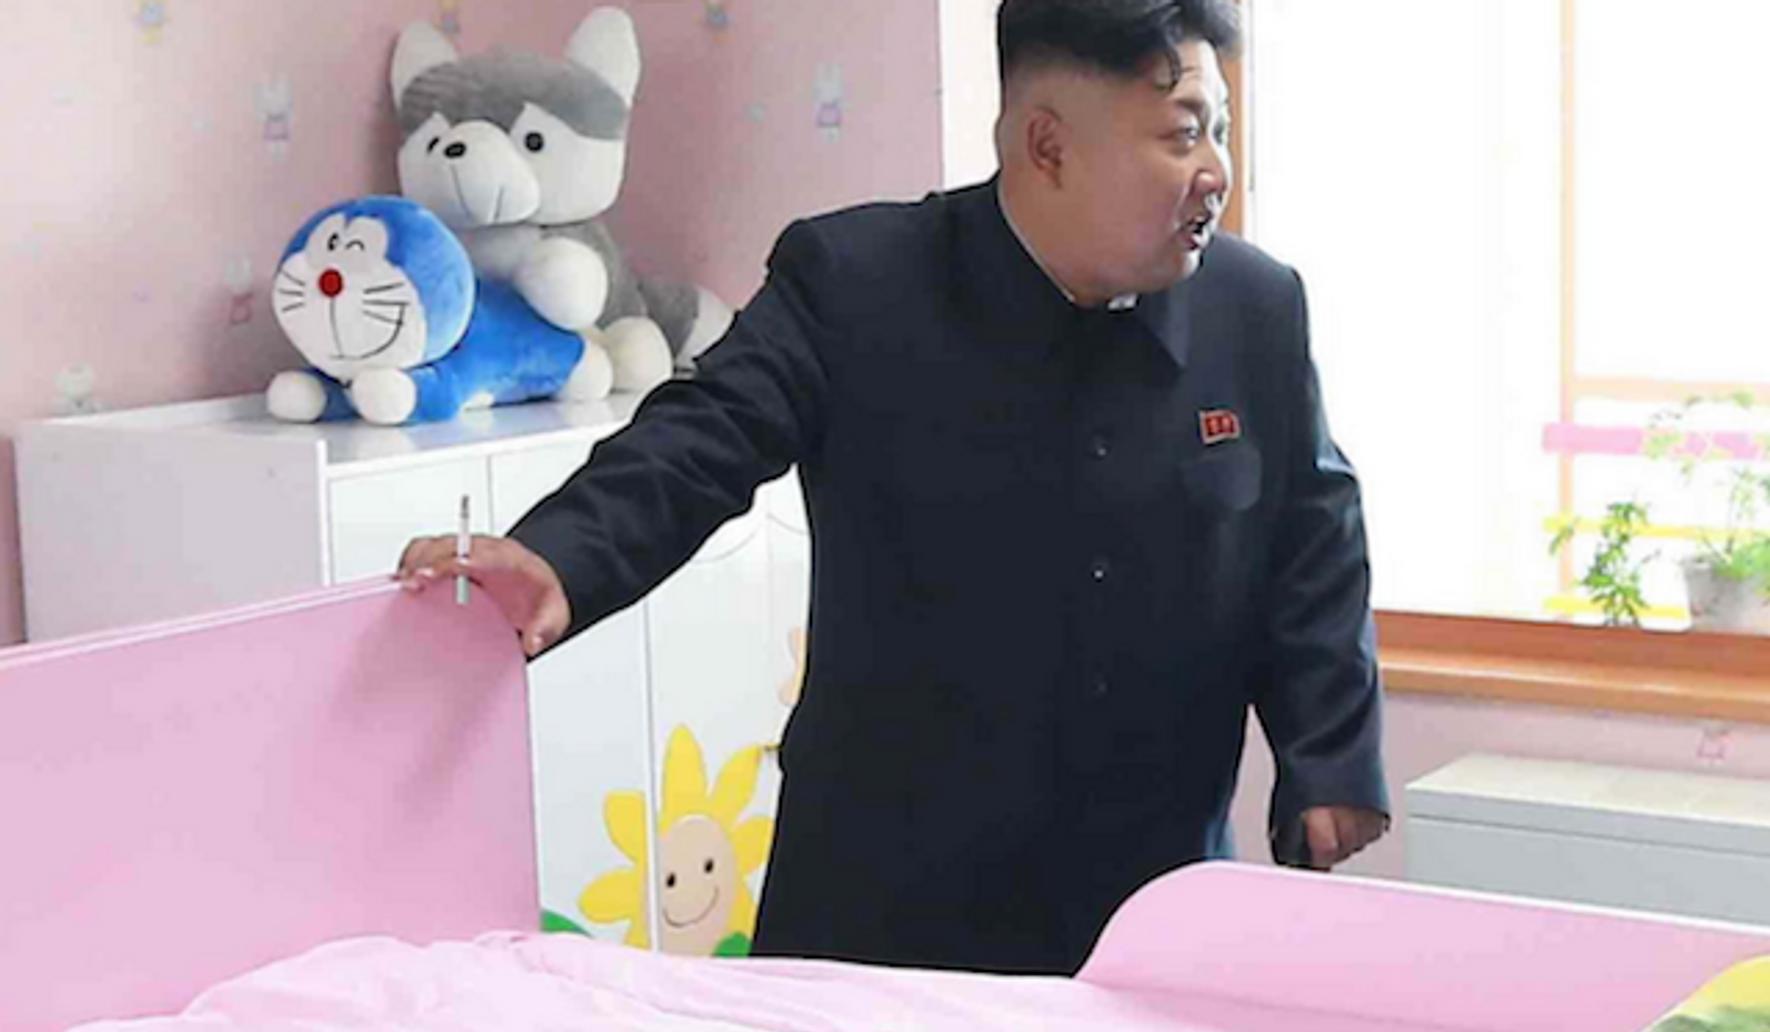 Kim Jong-un photobombed by fornicating furries - Washington